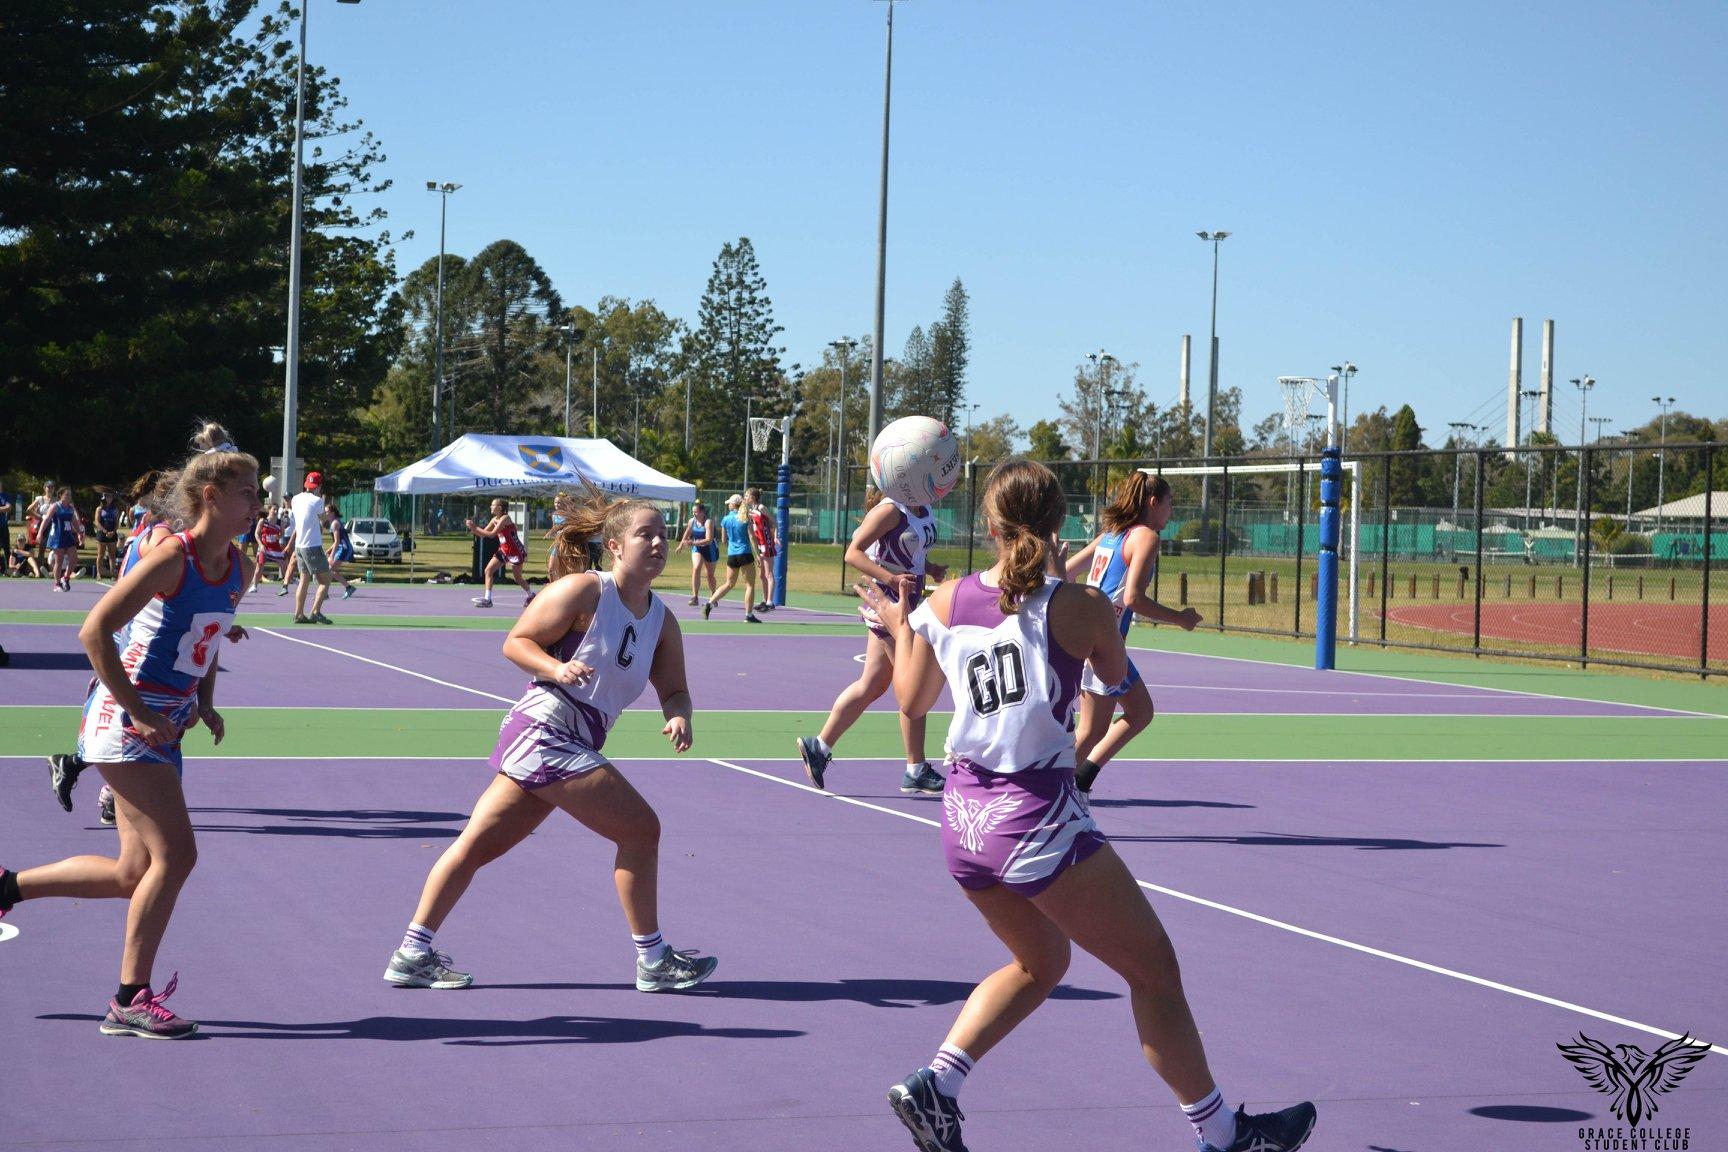 Playing netball